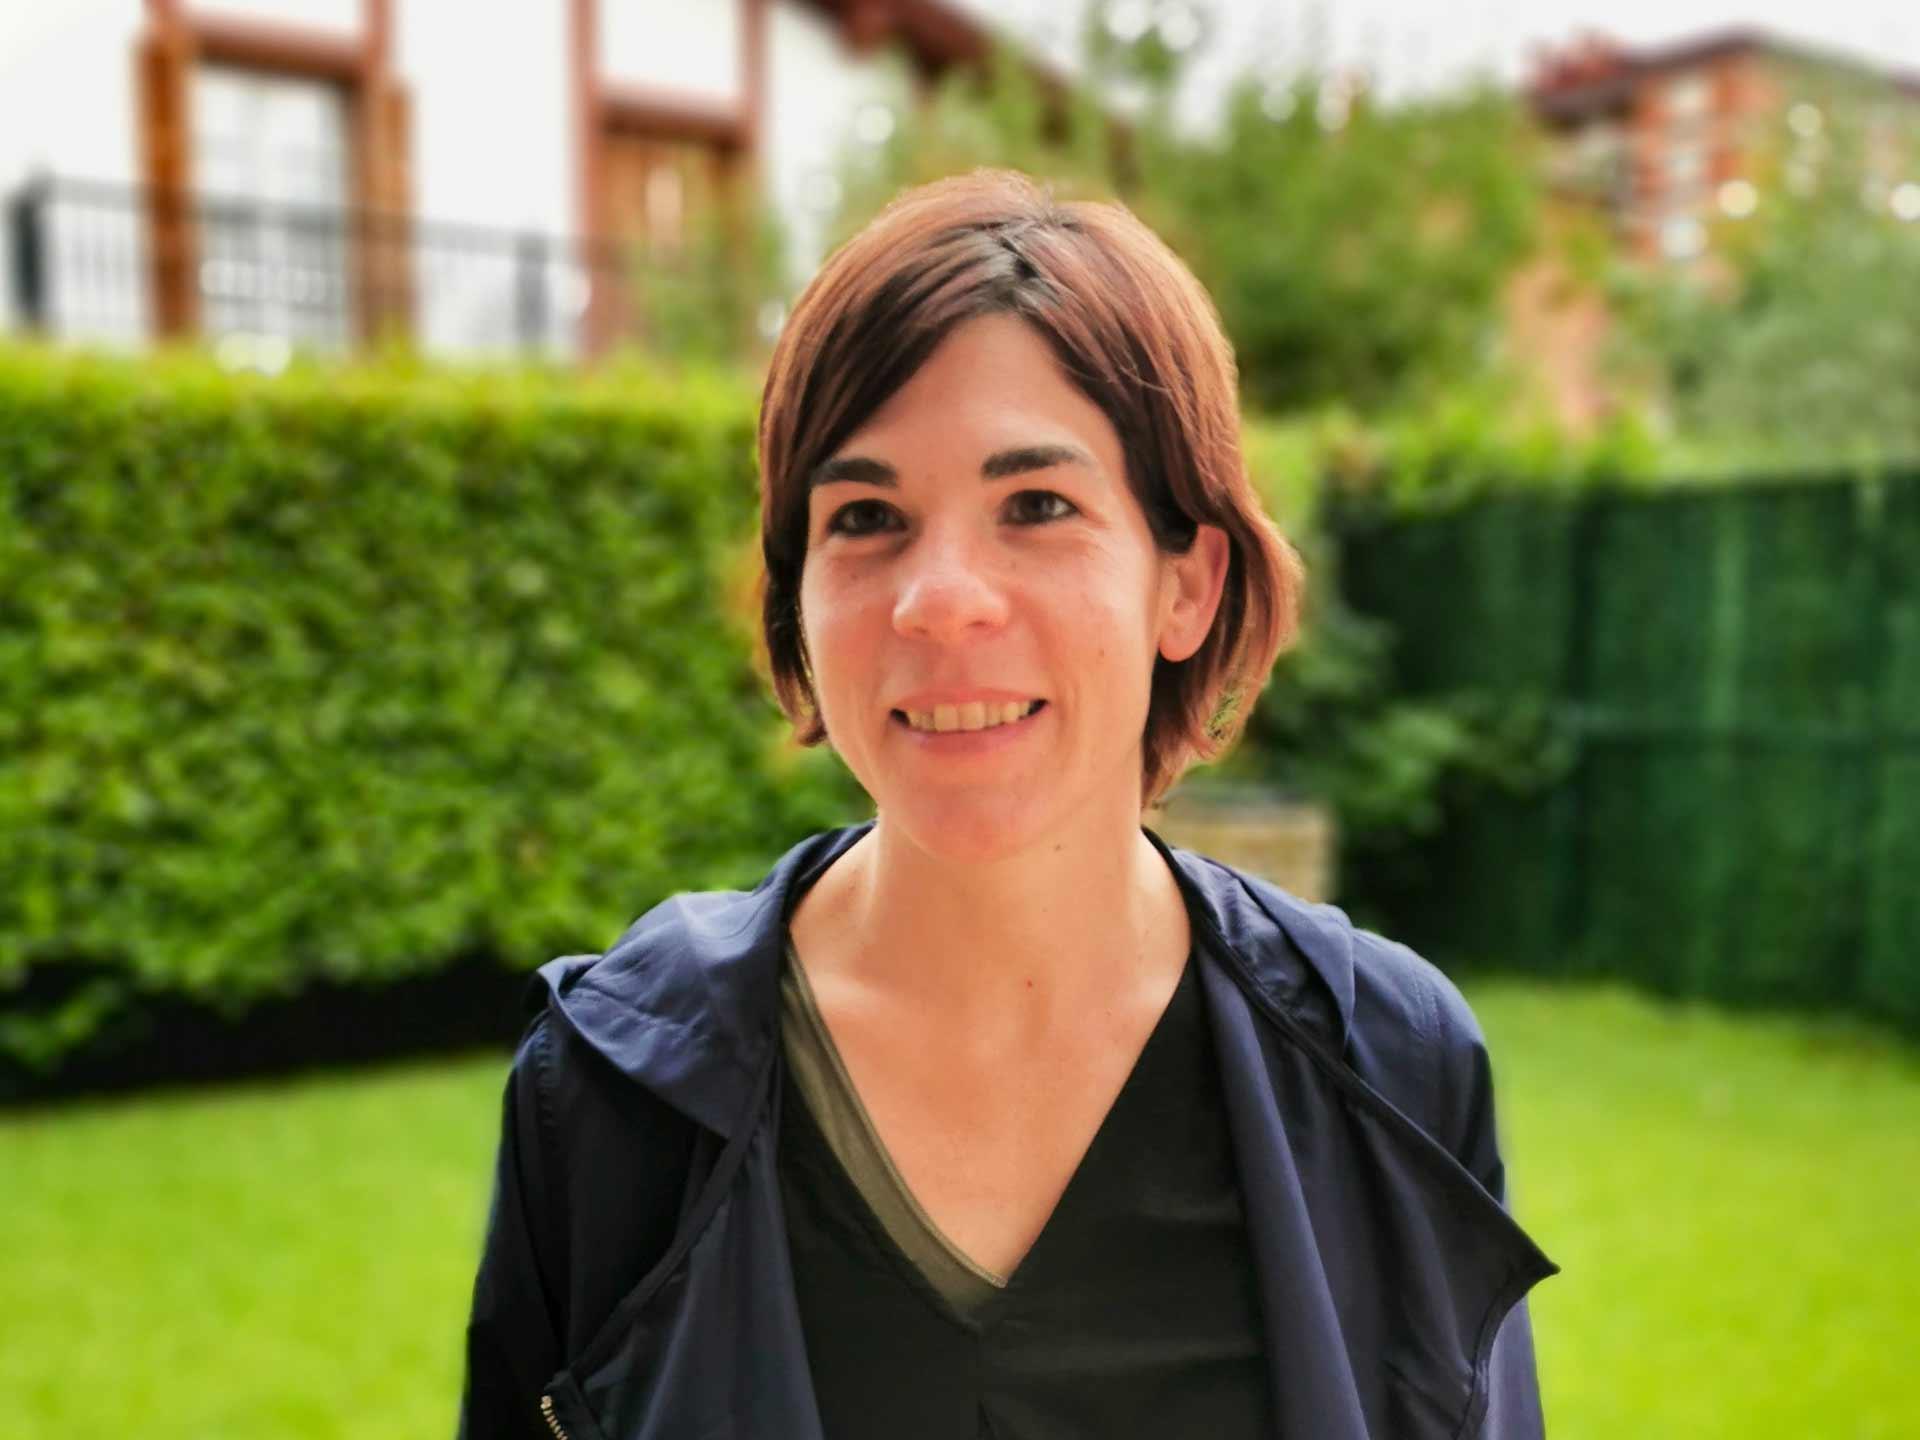 Garbi Ibañez